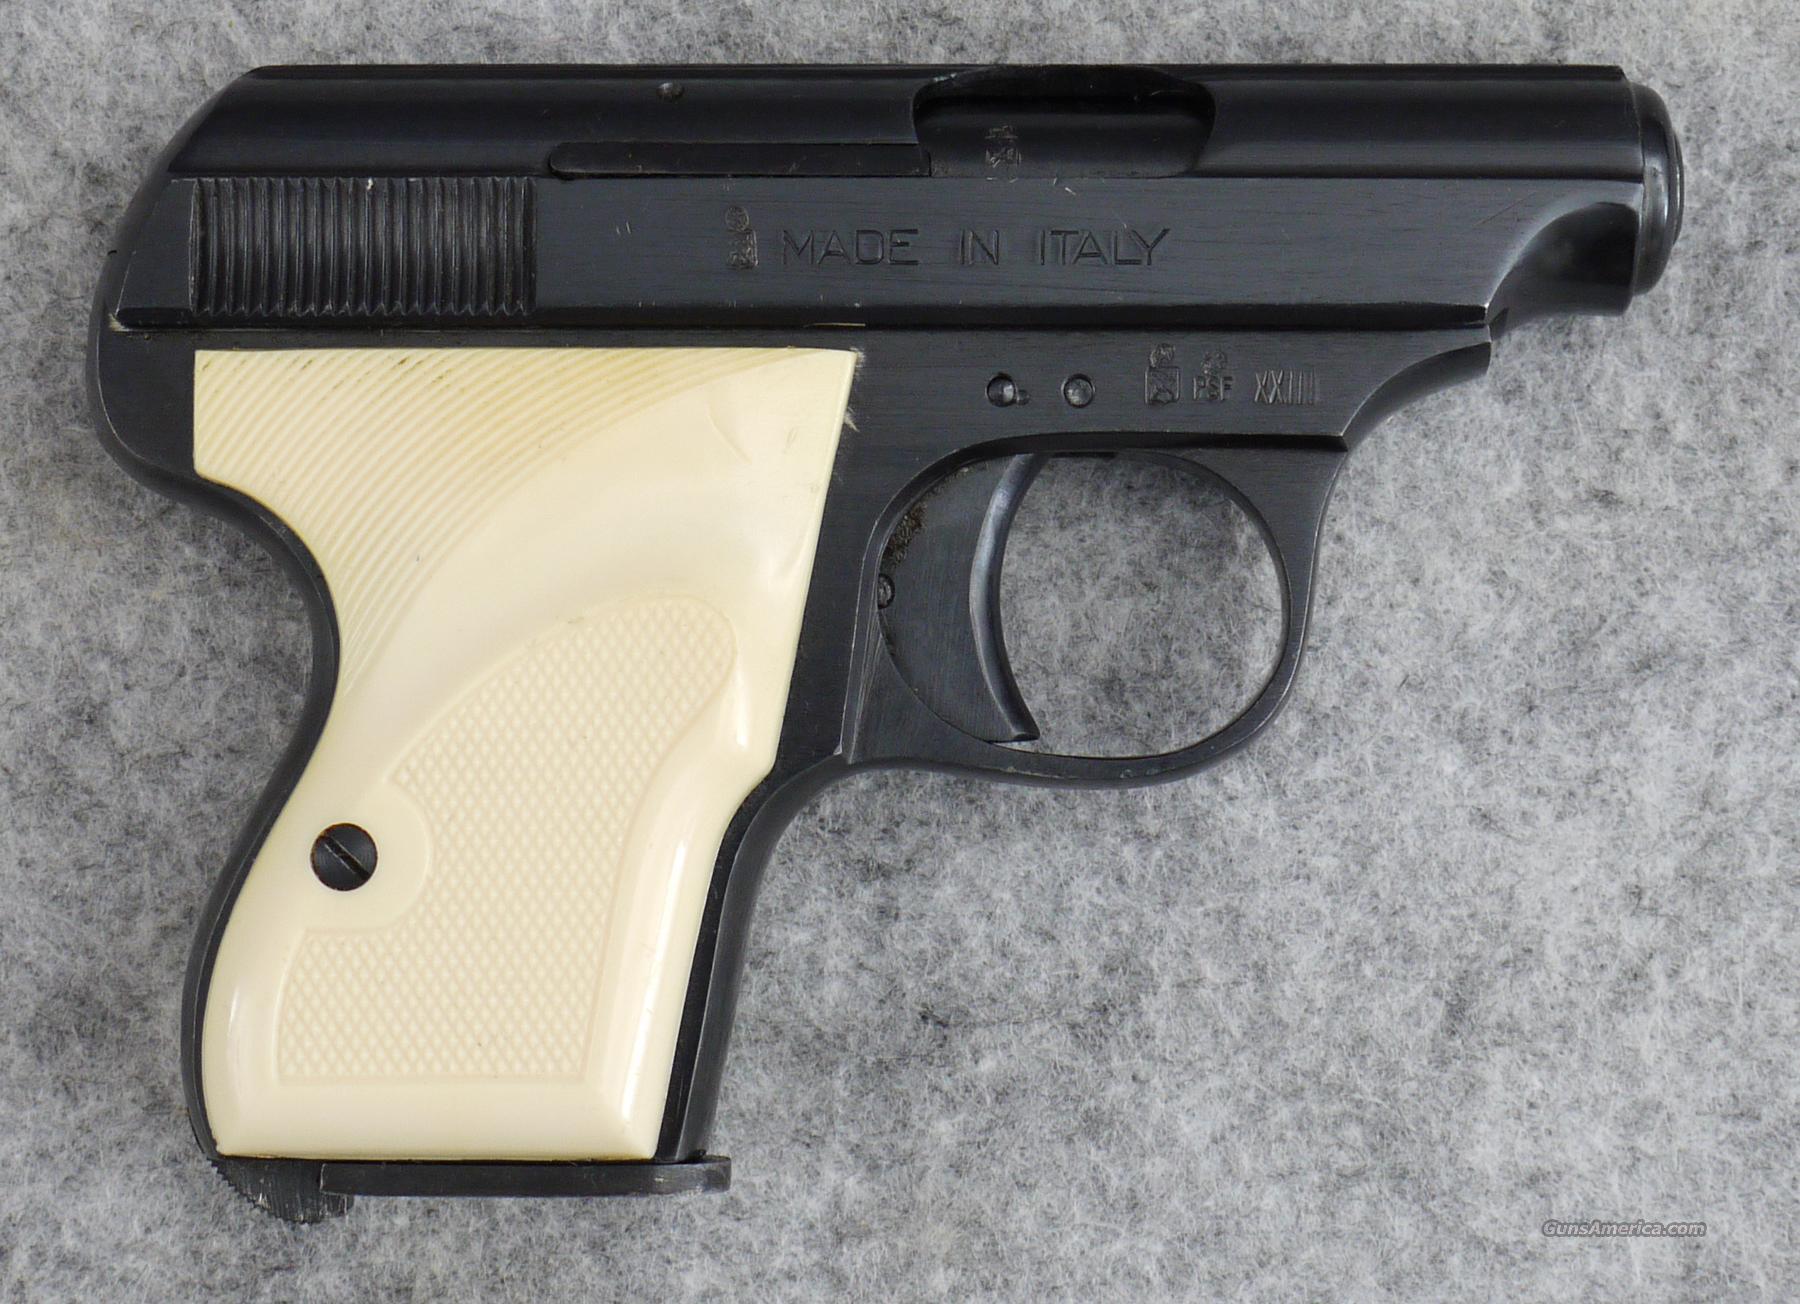 Dickson Detective (Galesi 6) 25 ACP - EXCELLENT  Guns